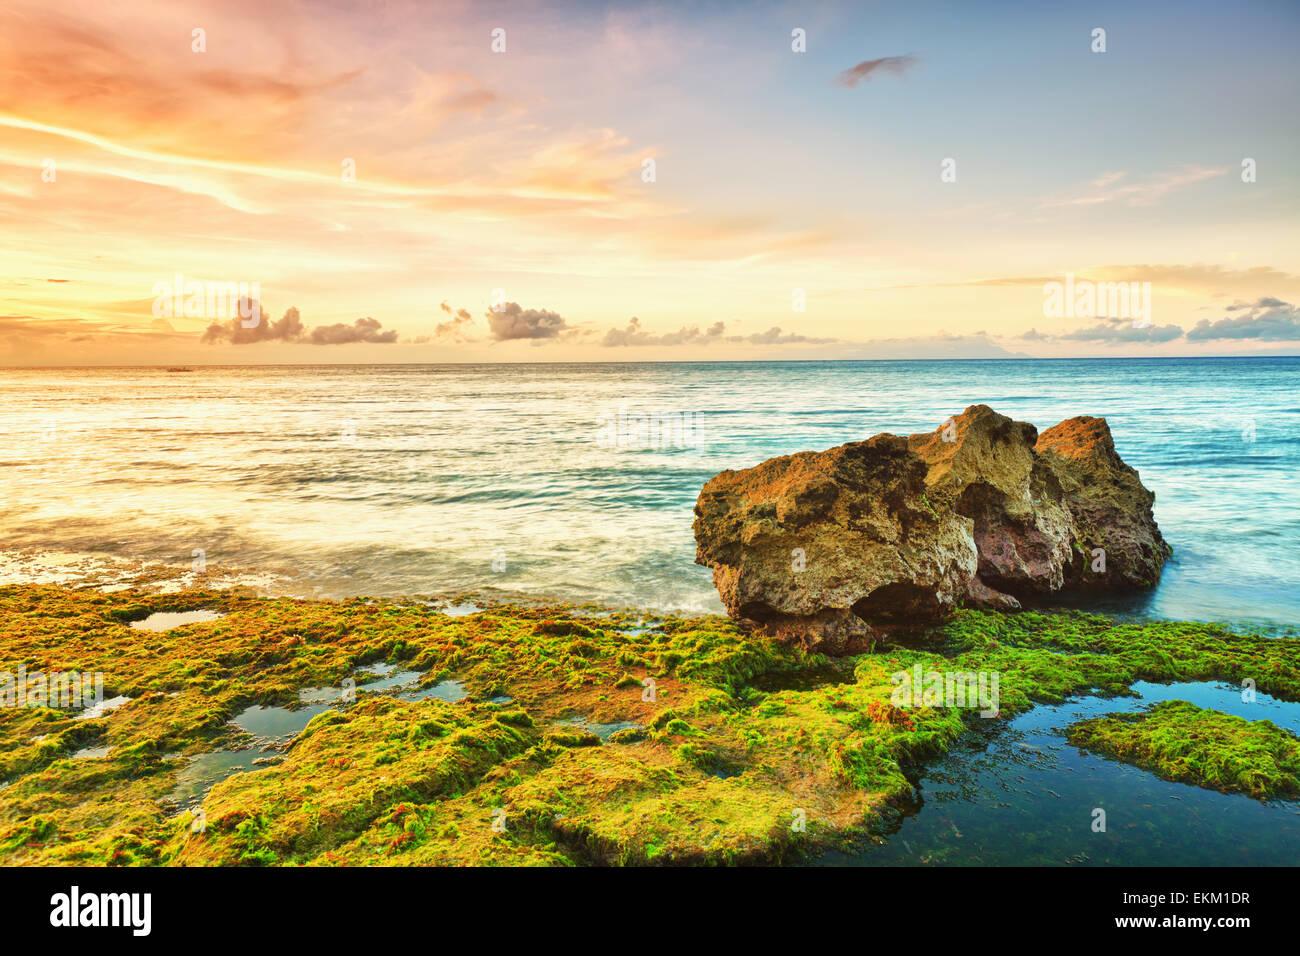 Hermoso paisaje costero. Piedra en primer plano. Filipinas Foto de stock